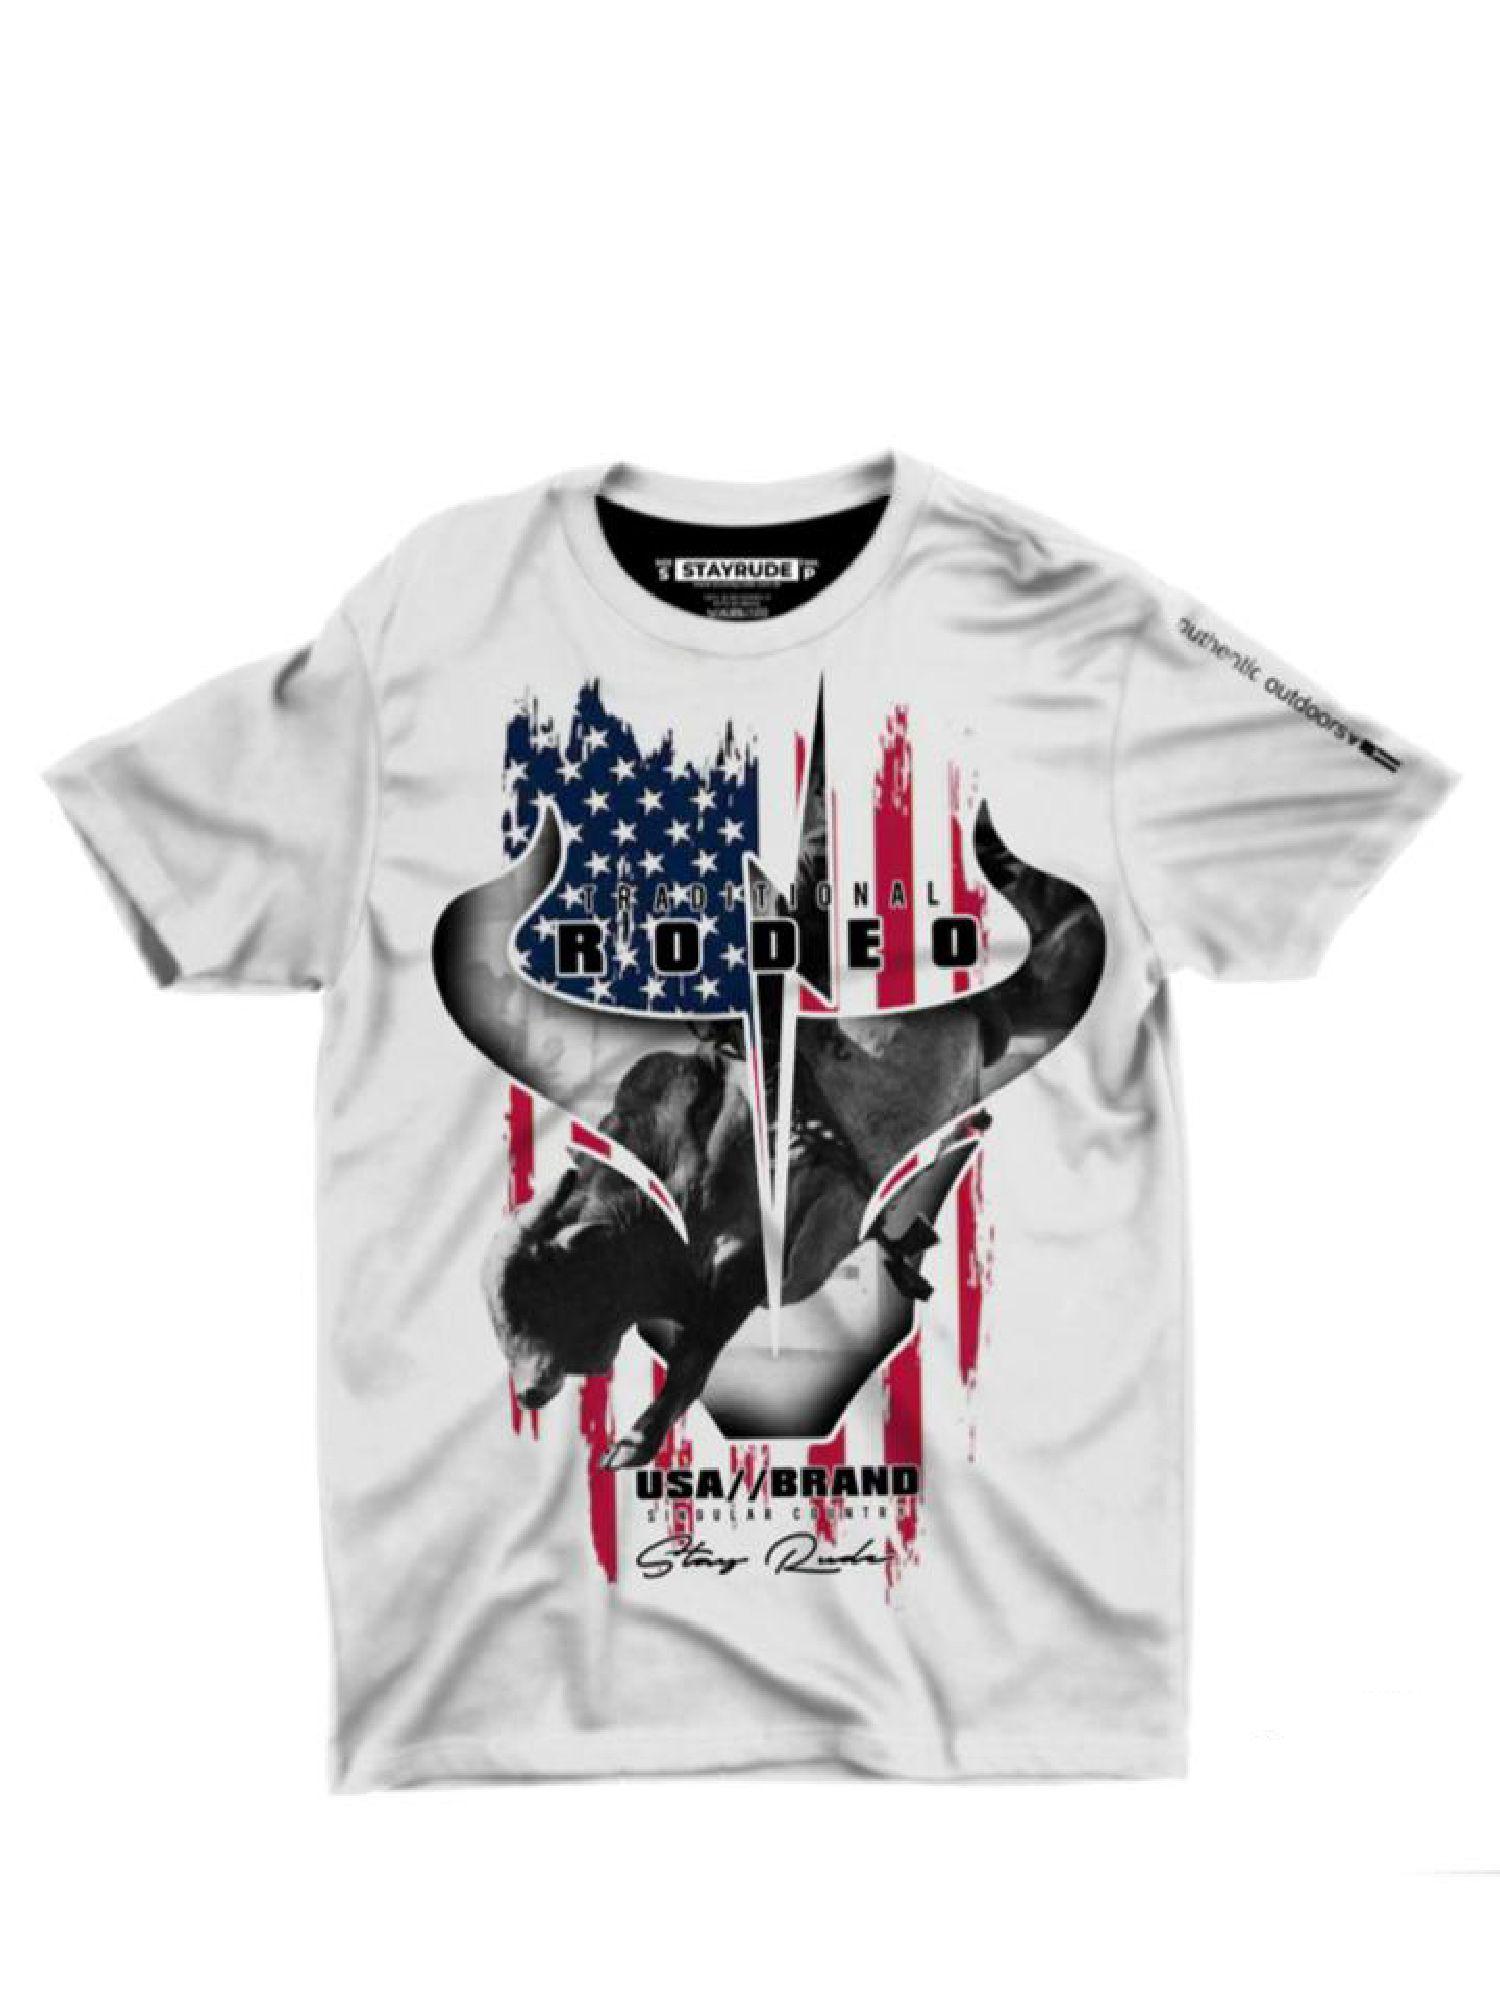 Camiseta Masculina Stay Rude Black Bull Rodeo